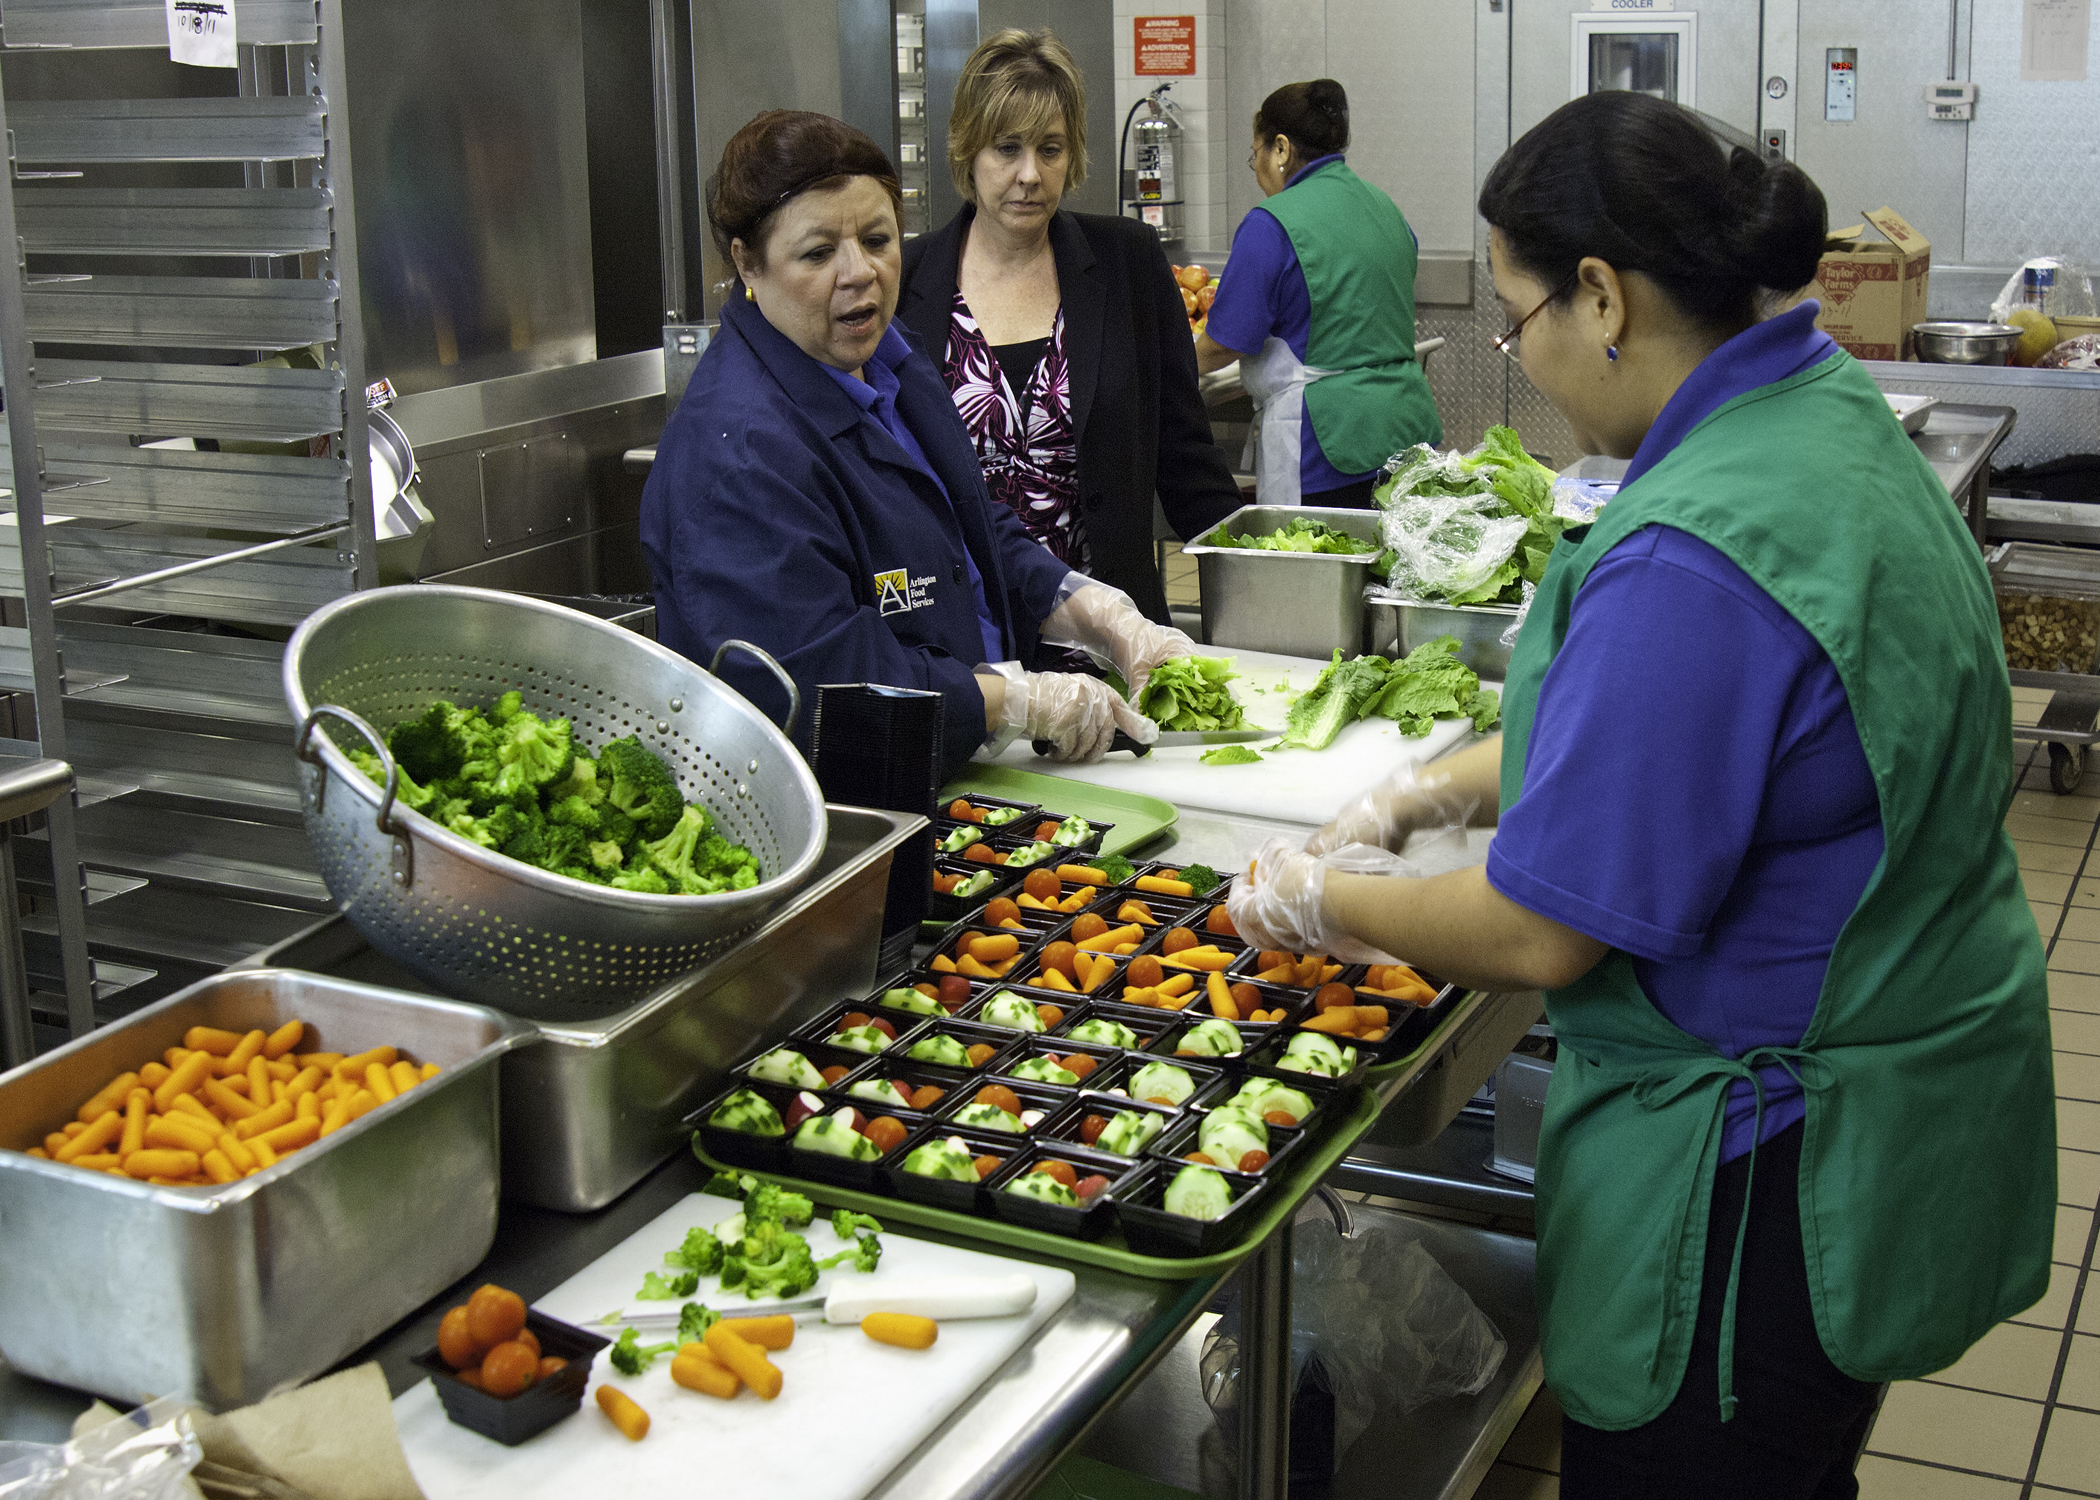 Free lunch preparation in schools